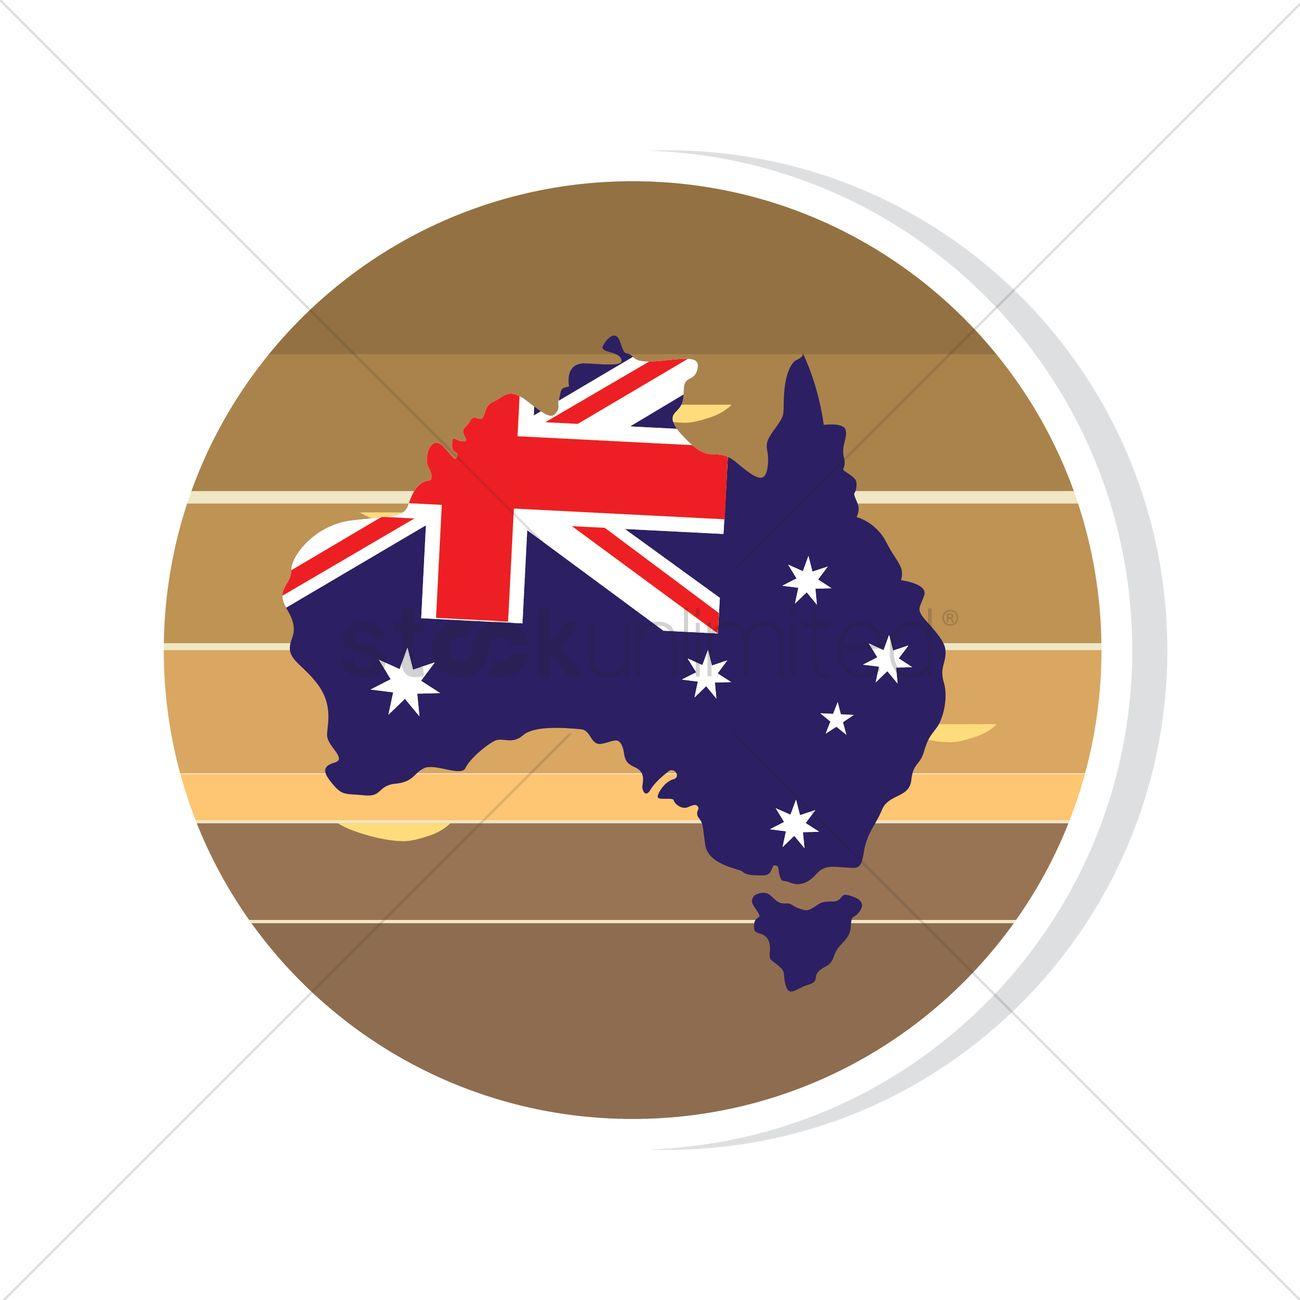 Australia flag on map sticker vector image 1961523 stockunlimited australia flag on map sticker vector graphic gumiabroncs Images